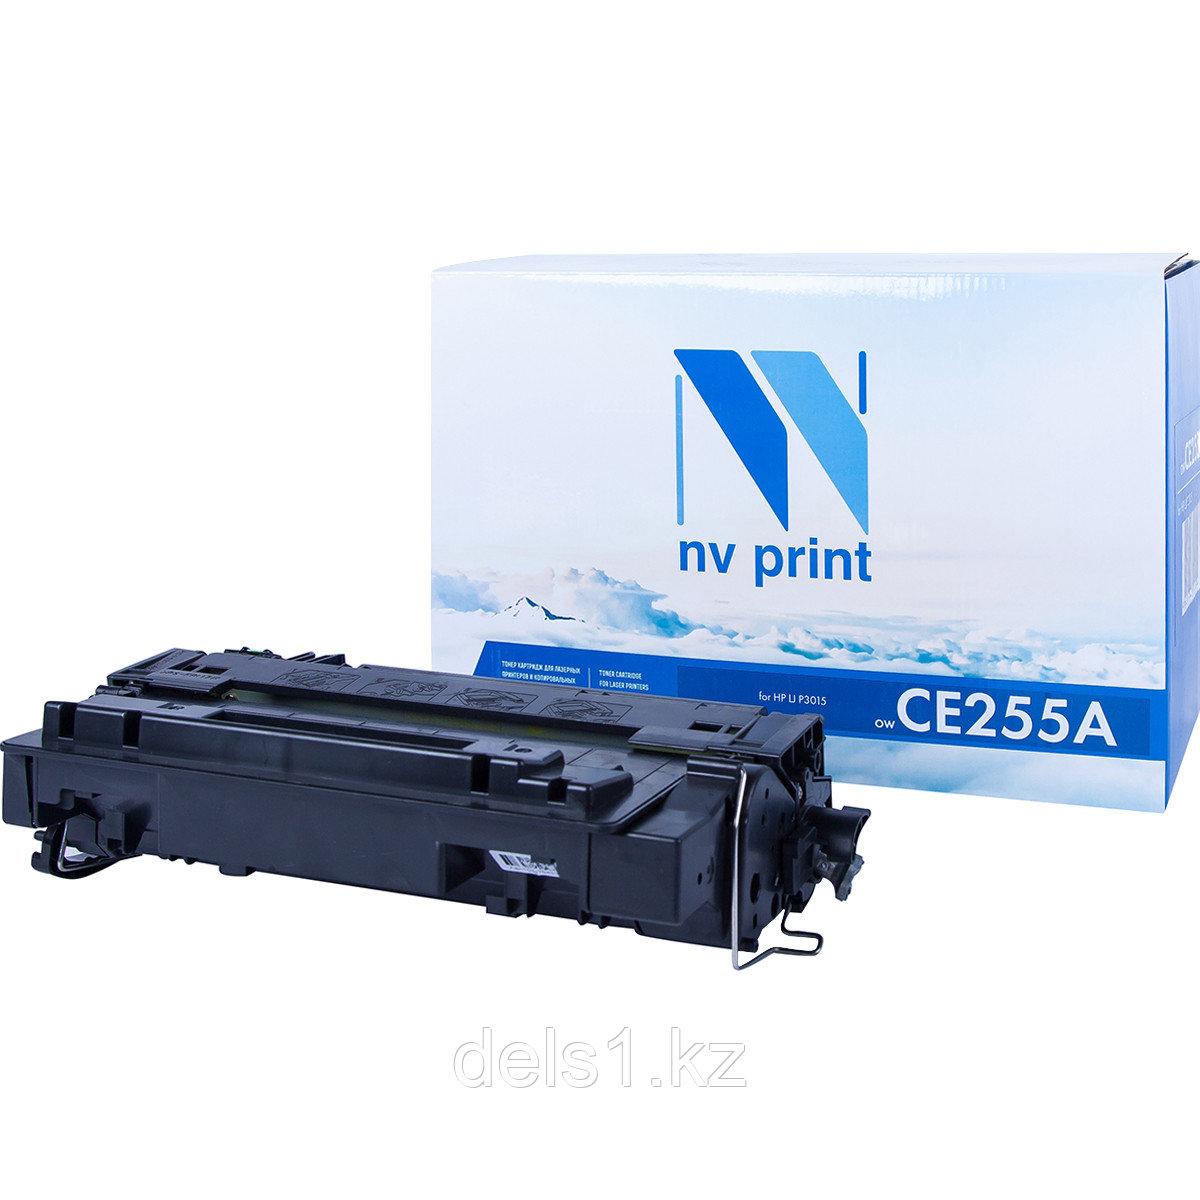 Картридж NVP NV-CE255A совместимый c HP LaserJet